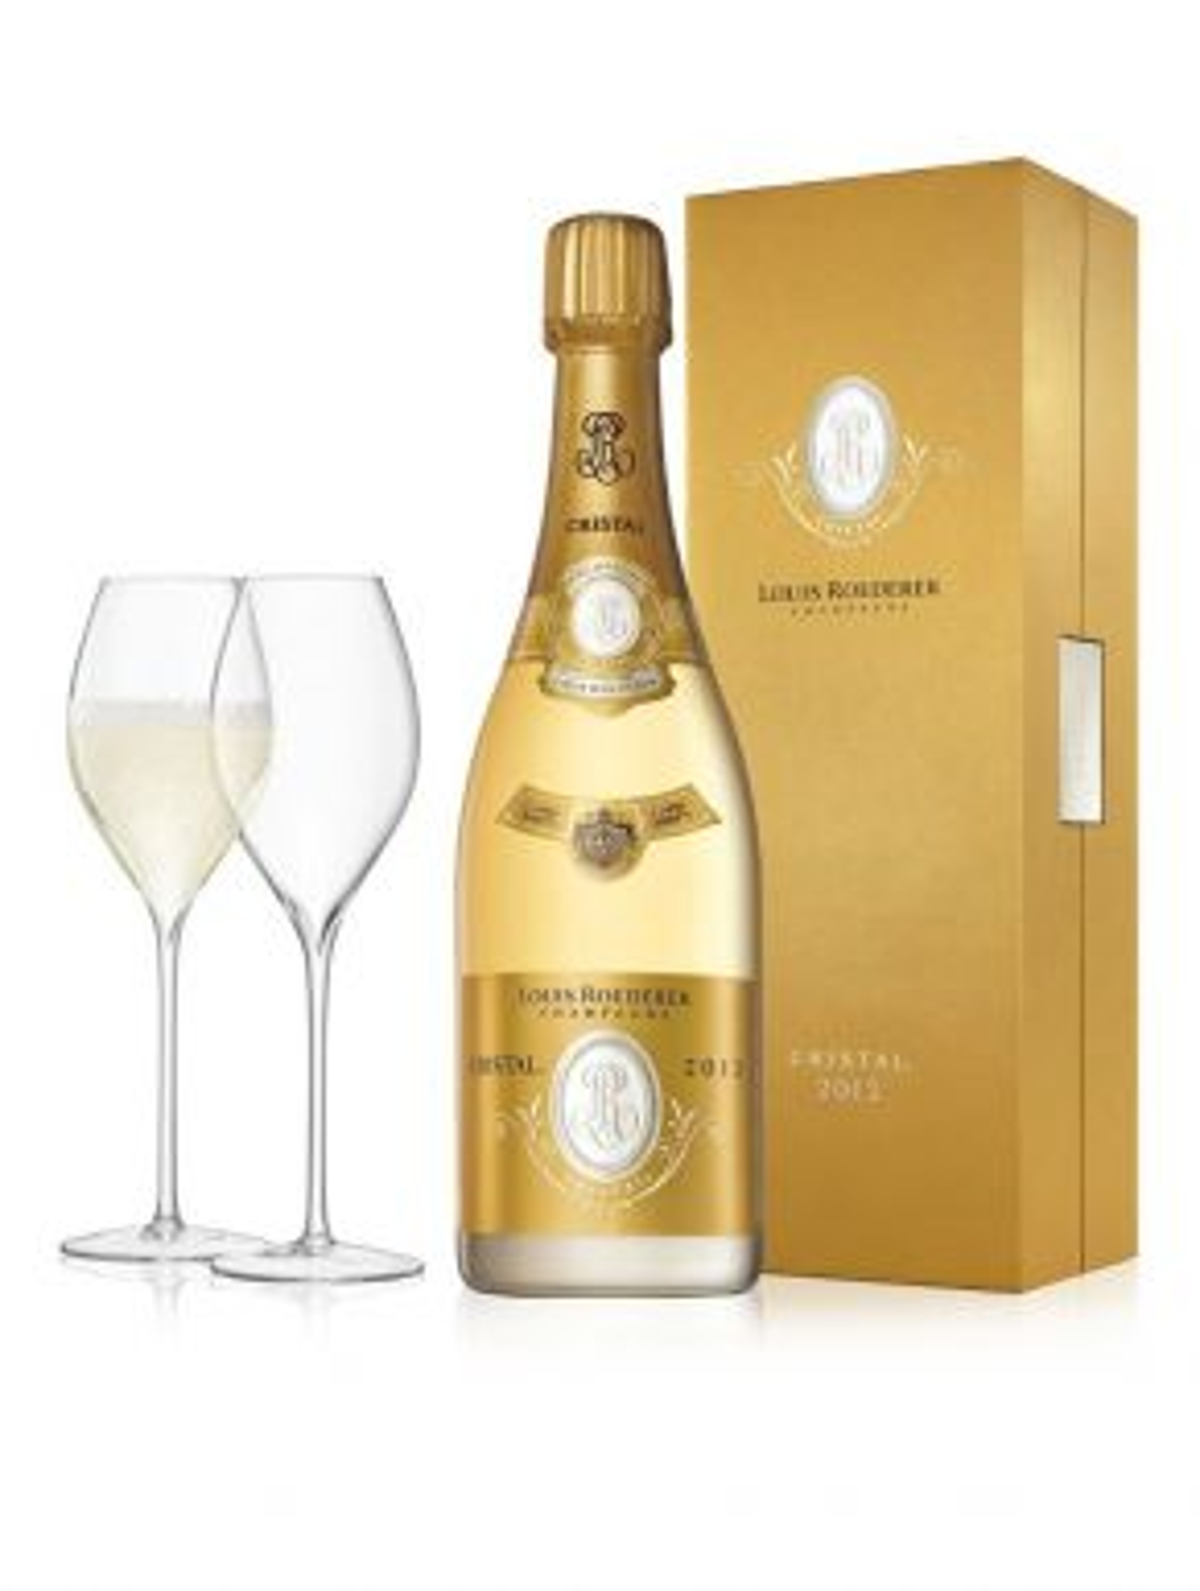 Louis Roederer Cristal 2009 Champagne Vintage & LSA Savoy Flutes